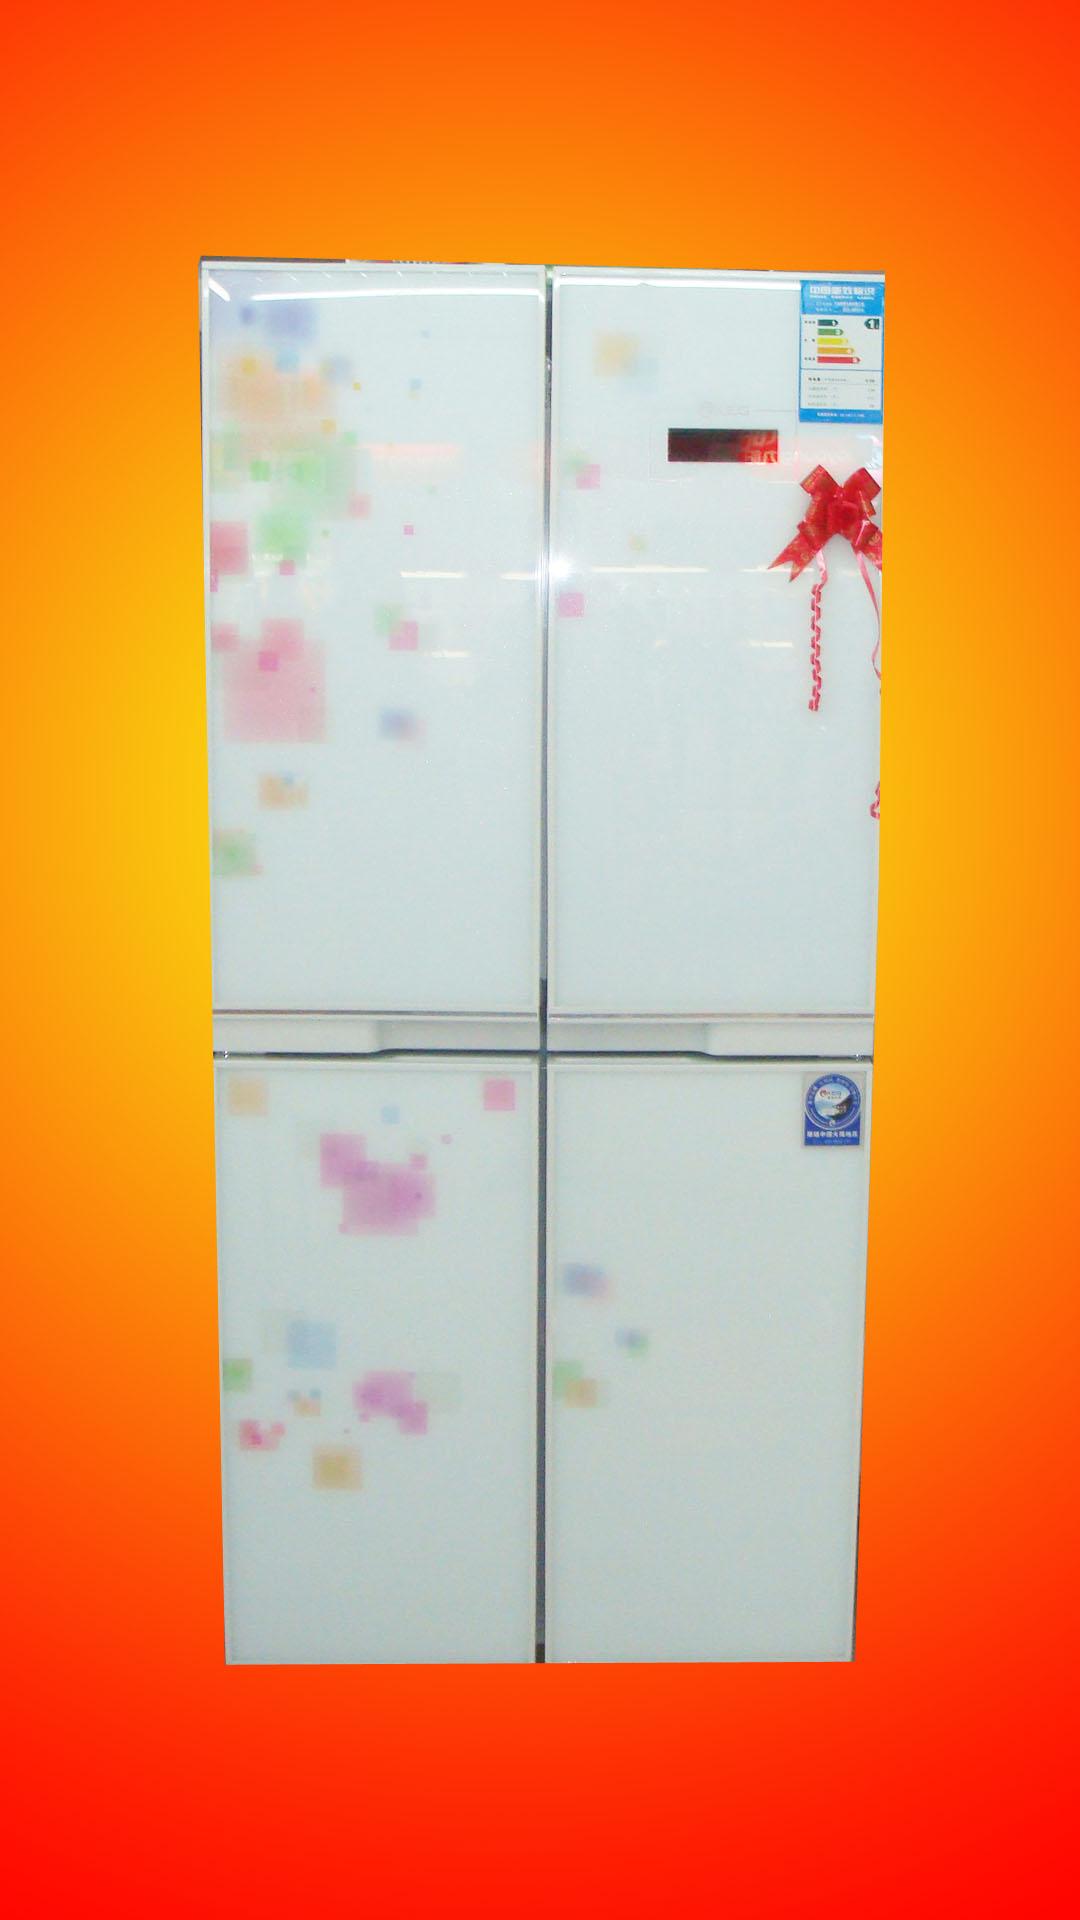 KEG韩电冰箱作为近两年来白电行业的一批黑马,异军突起,引得了各方面人士的注意。作为一家与韩国京都重工株式会社合资的冰箱制造企业,KEG韩电冰箱一直坚持以消费者为导向,自主创新的产品理念,专注于冰箱的研发与制造。2010年中国韩电集团的成立,是KEG韩电冰箱在家用电器领域发展的一个光辉里程碑。中国韩电集团目前拥有两个冰箱生产基地,新投资的豪华冰箱生产线计划在2011年4月份投入使用,年产冰箱可达到150万台。